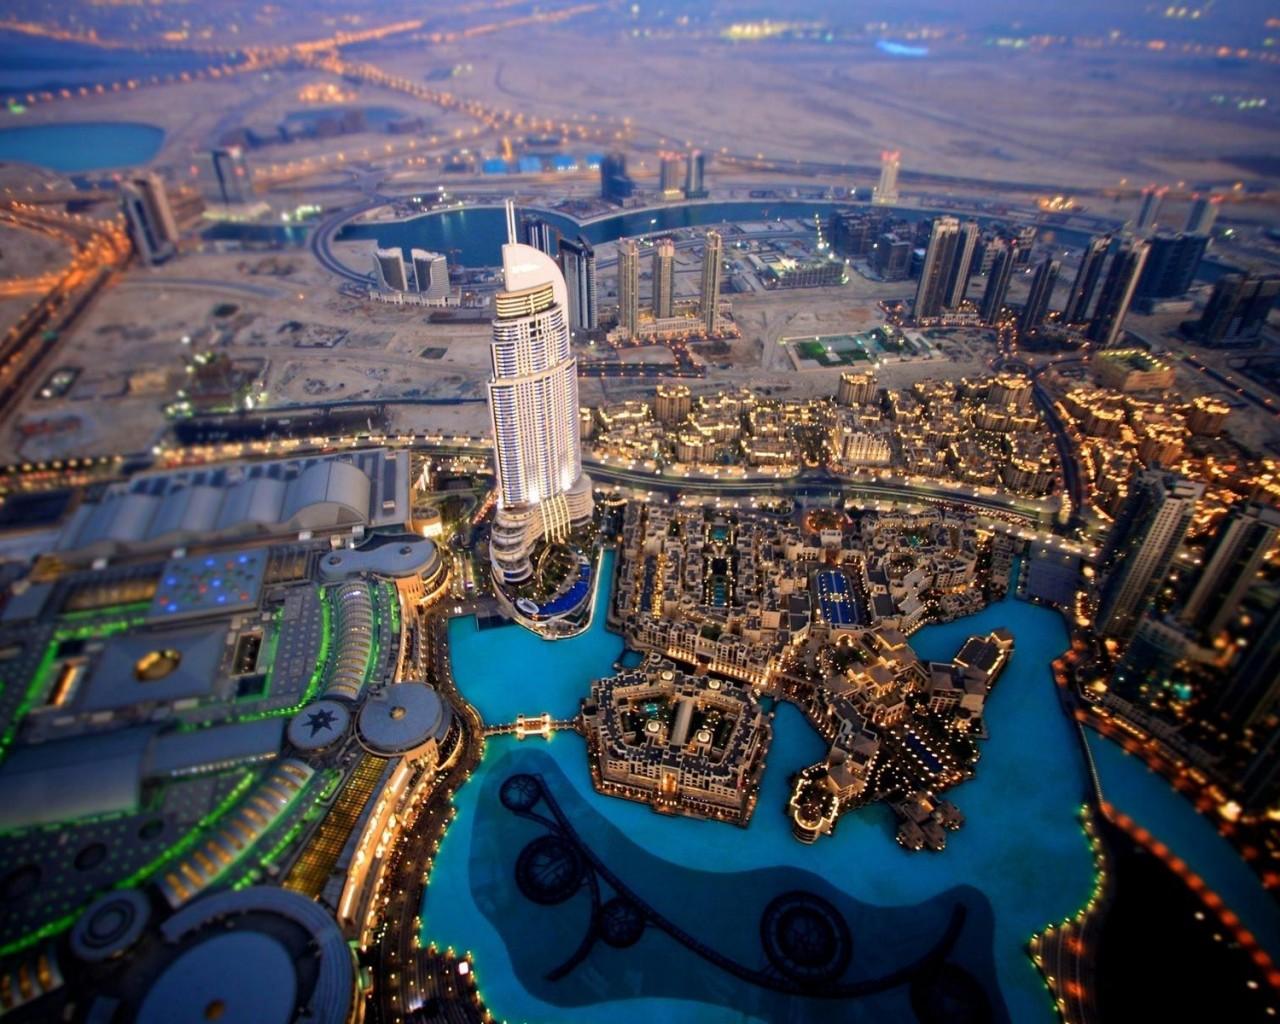 Evening-Dubai-United-Arab-Emirates-City-1024x12801